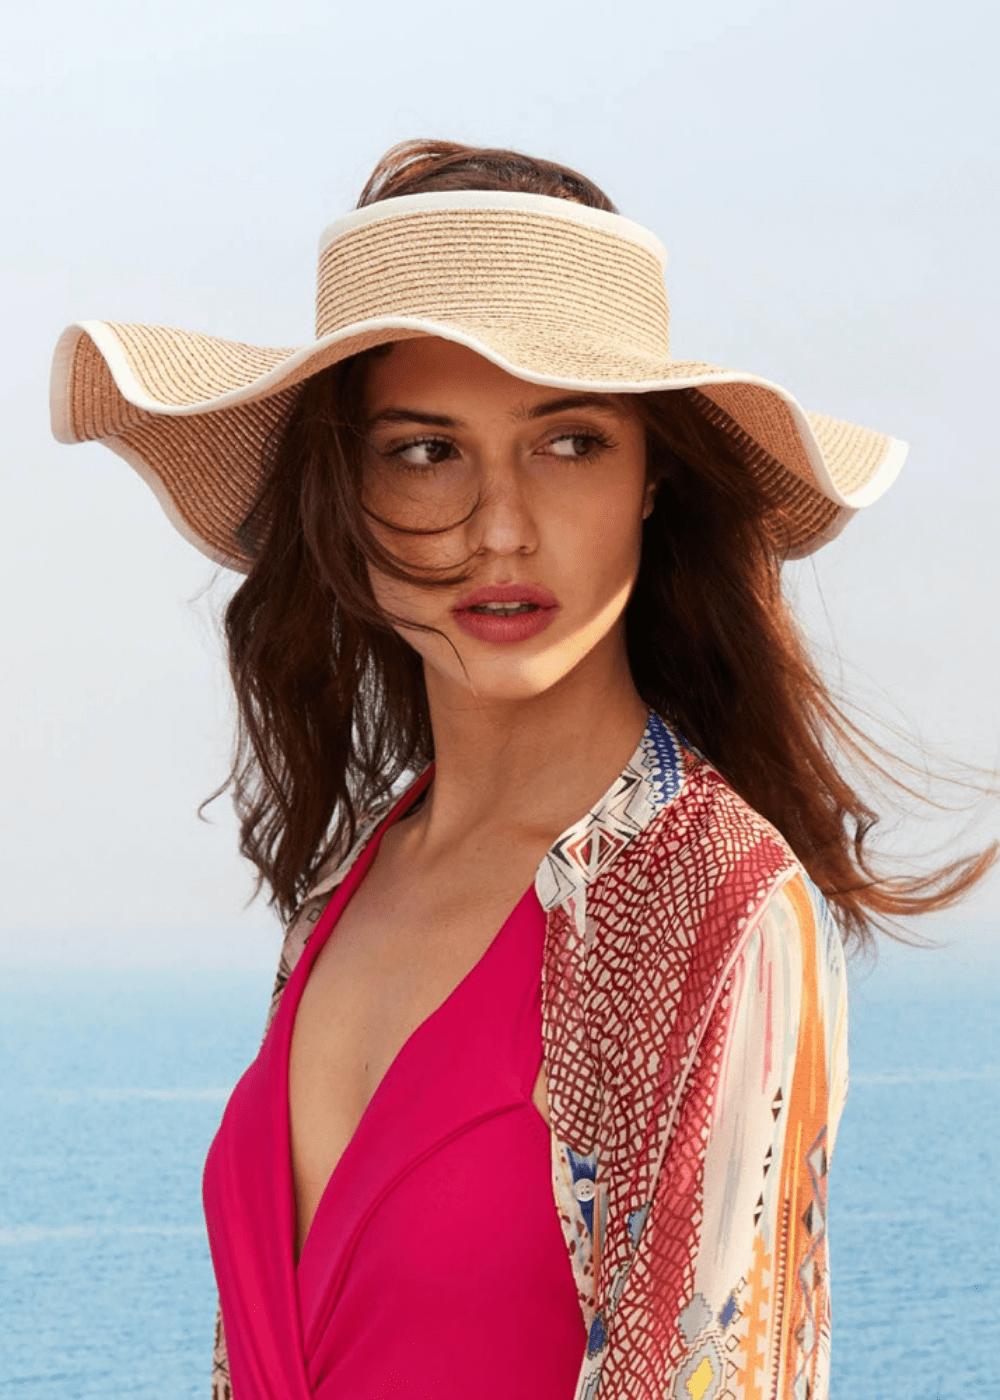 Ciapas visor hat - Safari - Woman